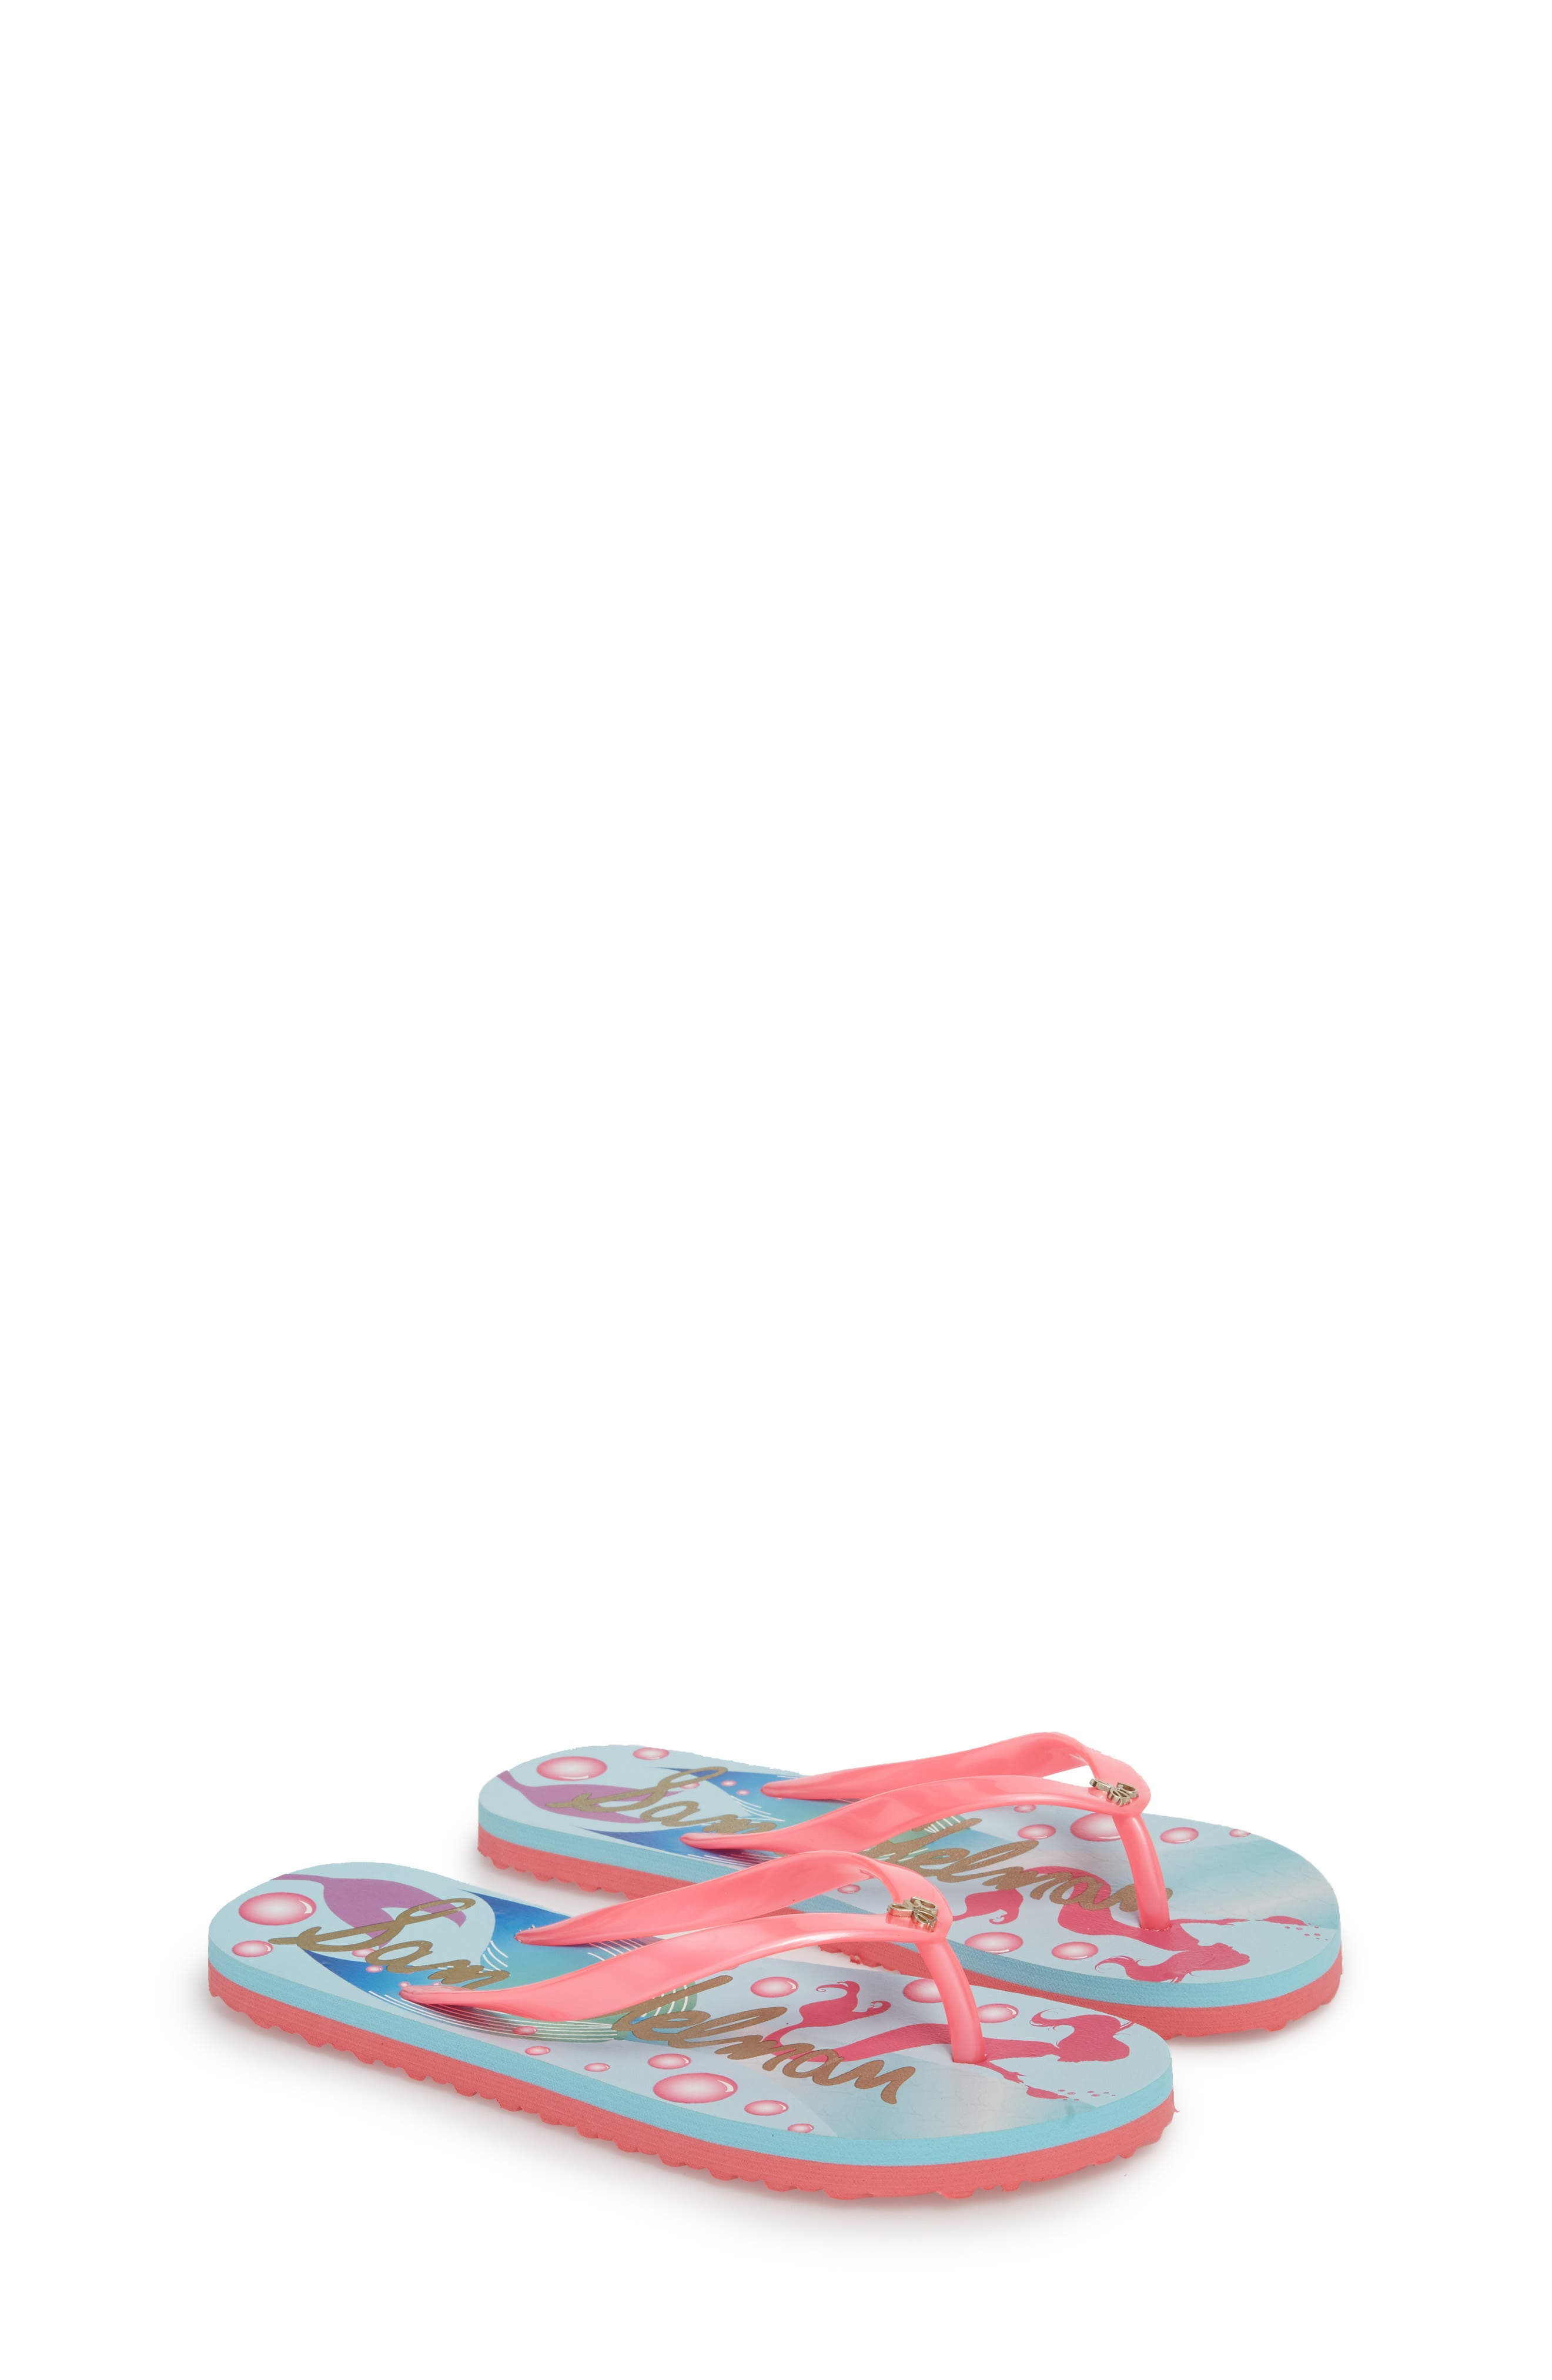 Mandy Flip Flop,                             Alternate thumbnail 3, color,                             Mermaid Turquoise/ Pink